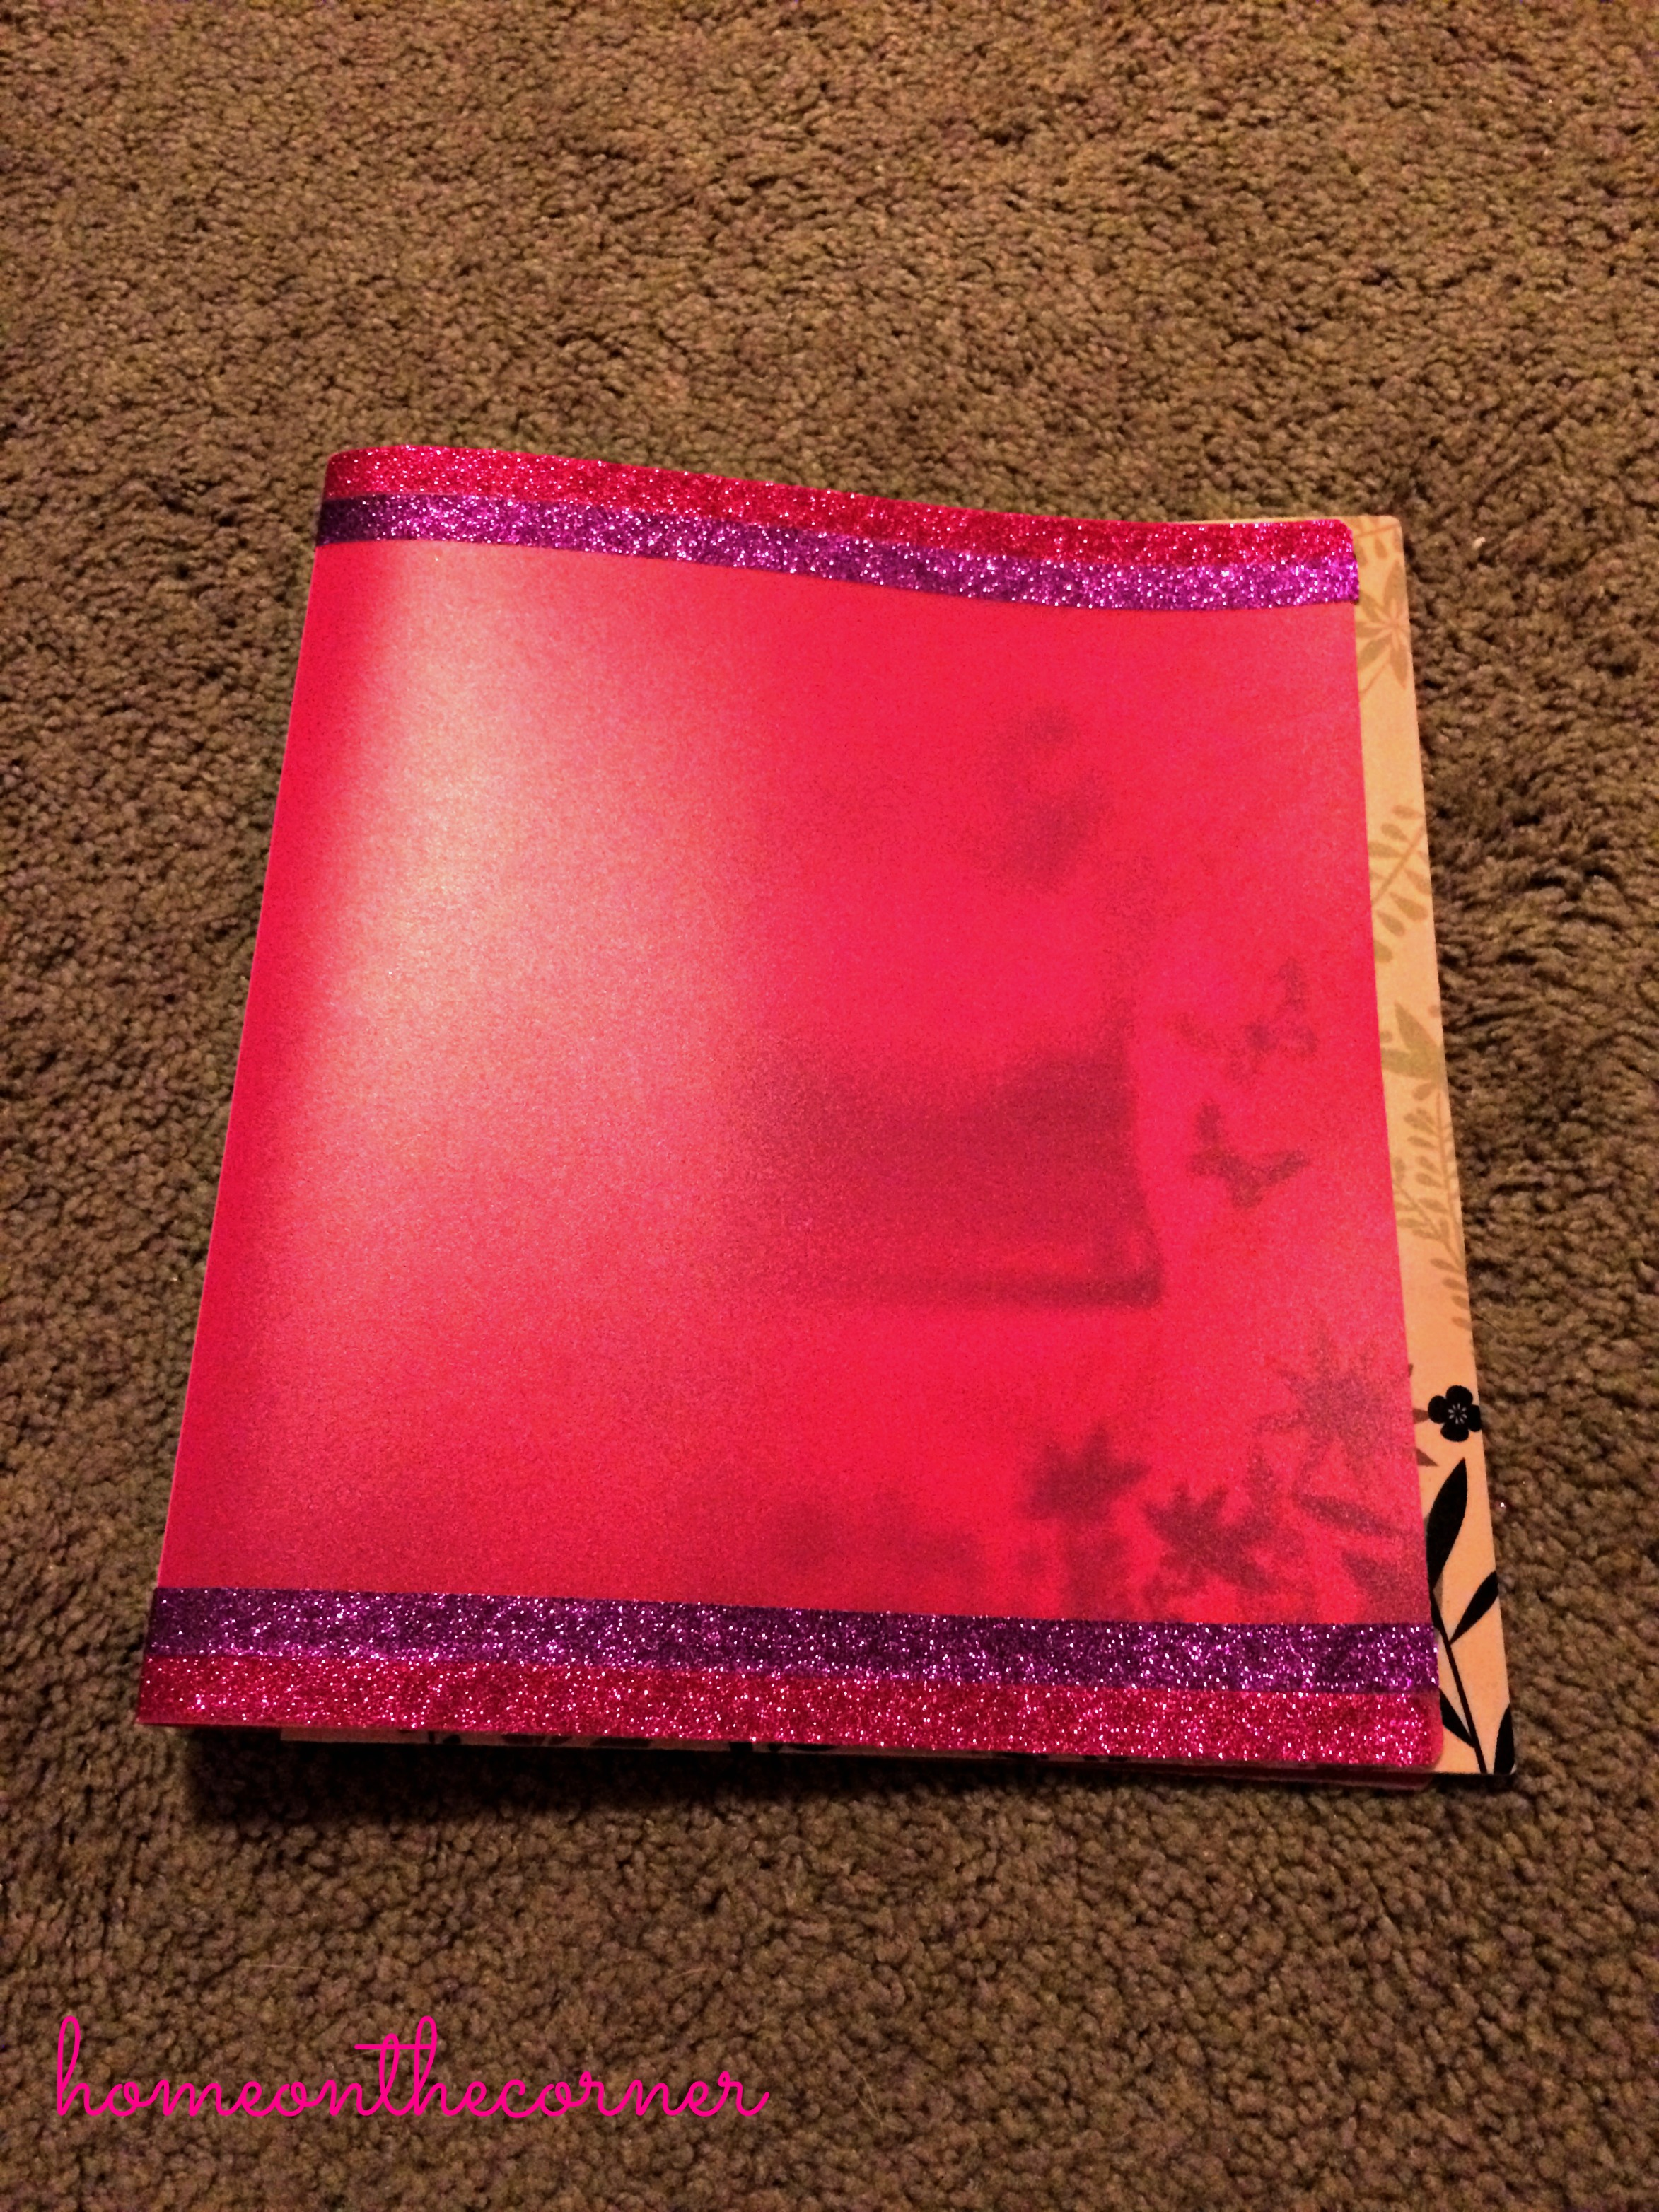 Pink Binder Final